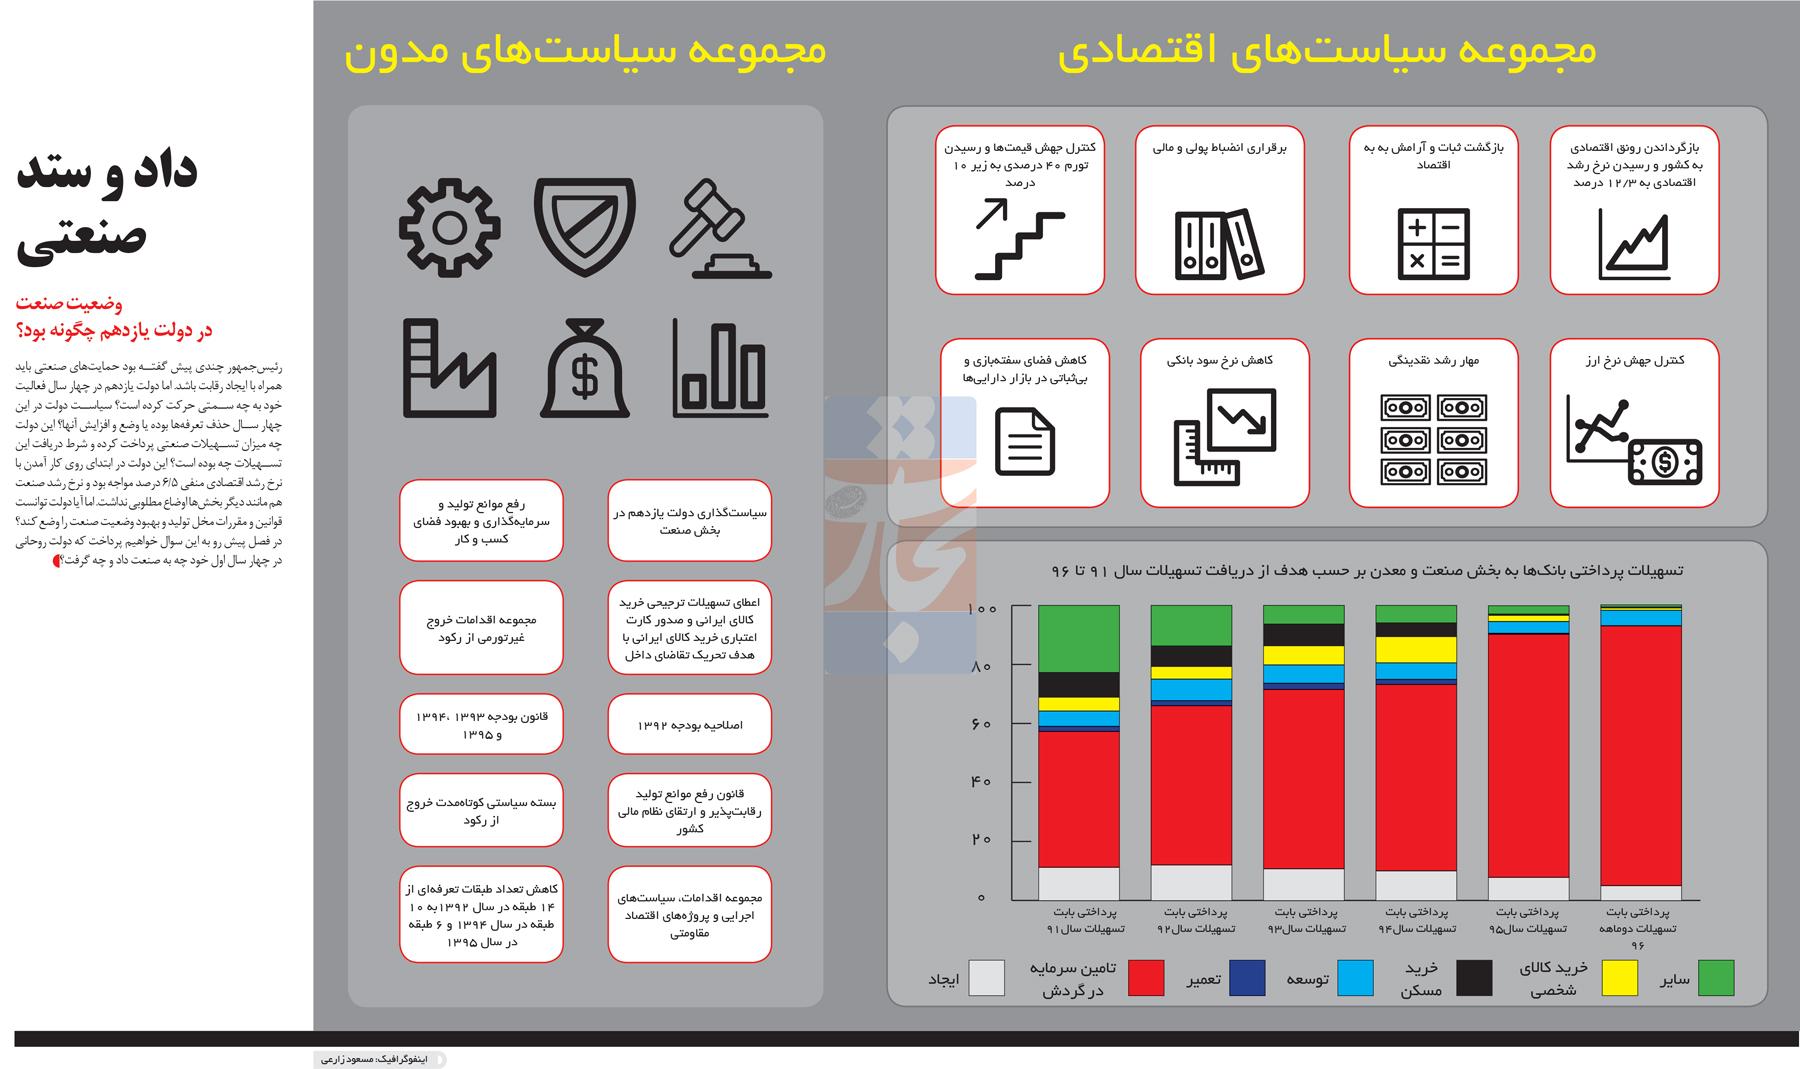 تجارت- فردا- اقتصاد سیاسی صنعت(اینفوگرافیک)